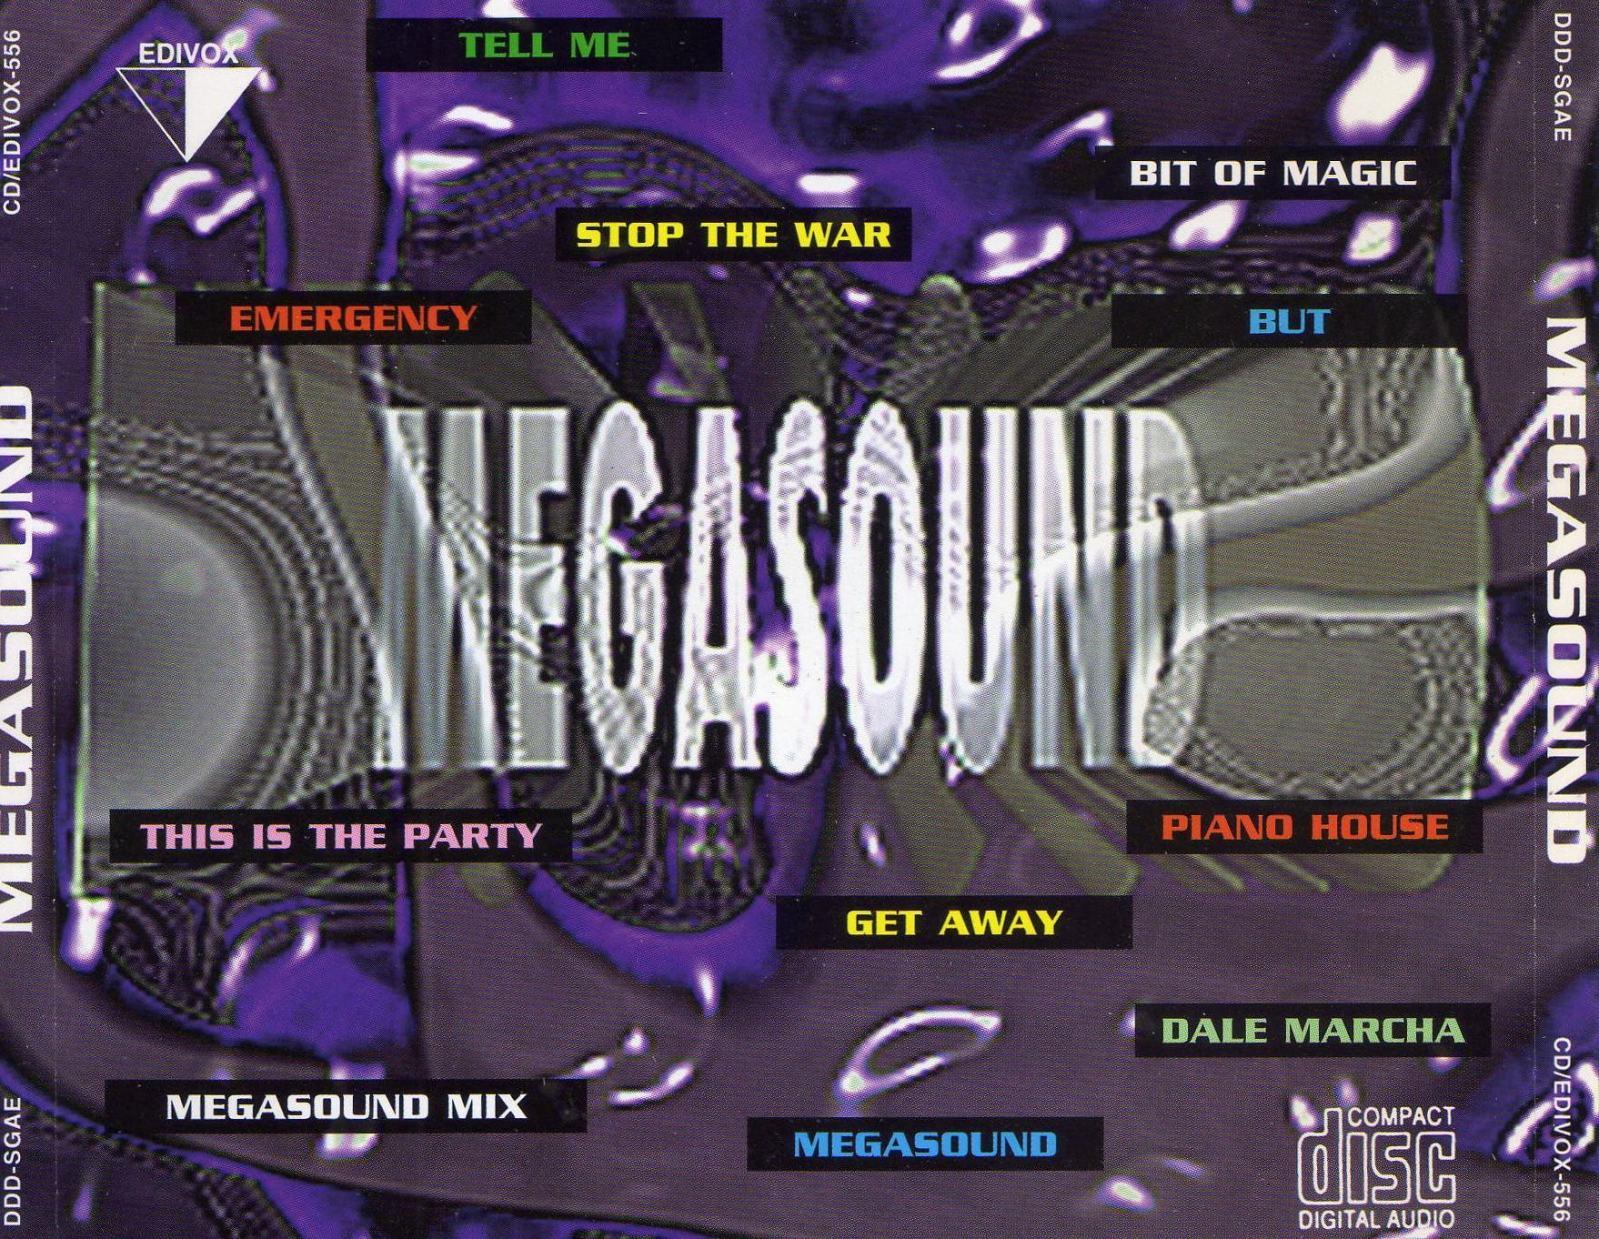 MEGASOUND MIX (1997) EDIVOX 10h0fmq